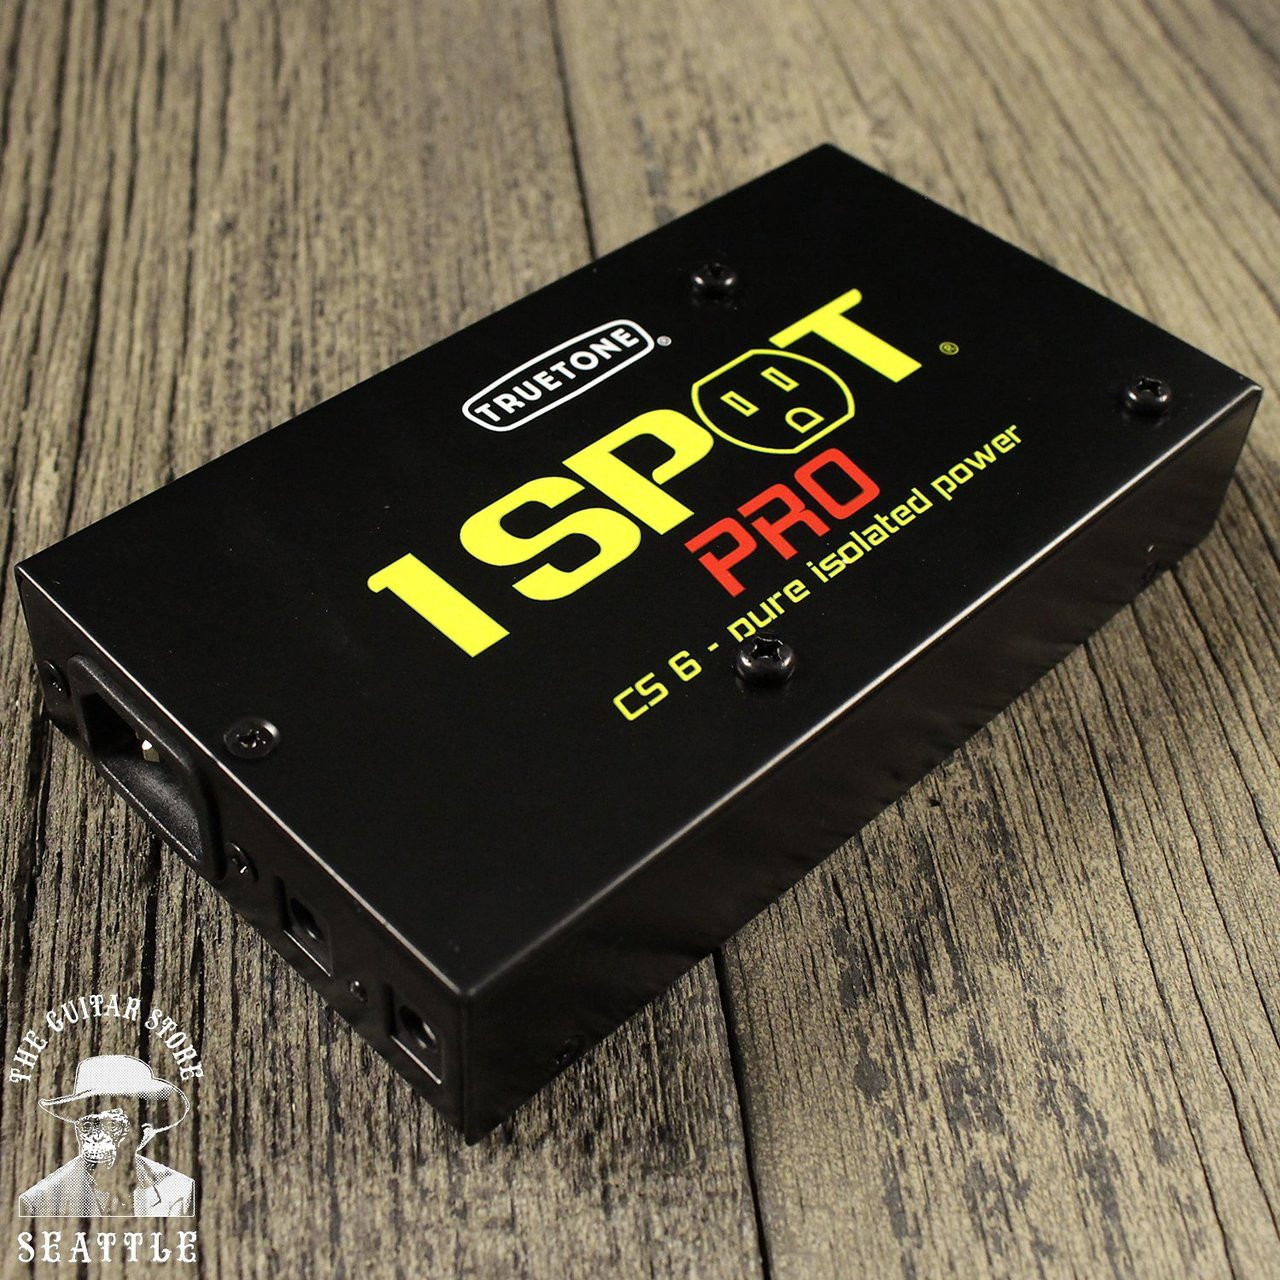 Truetone 1 Spot Pro CS6 Pedal Power Supply